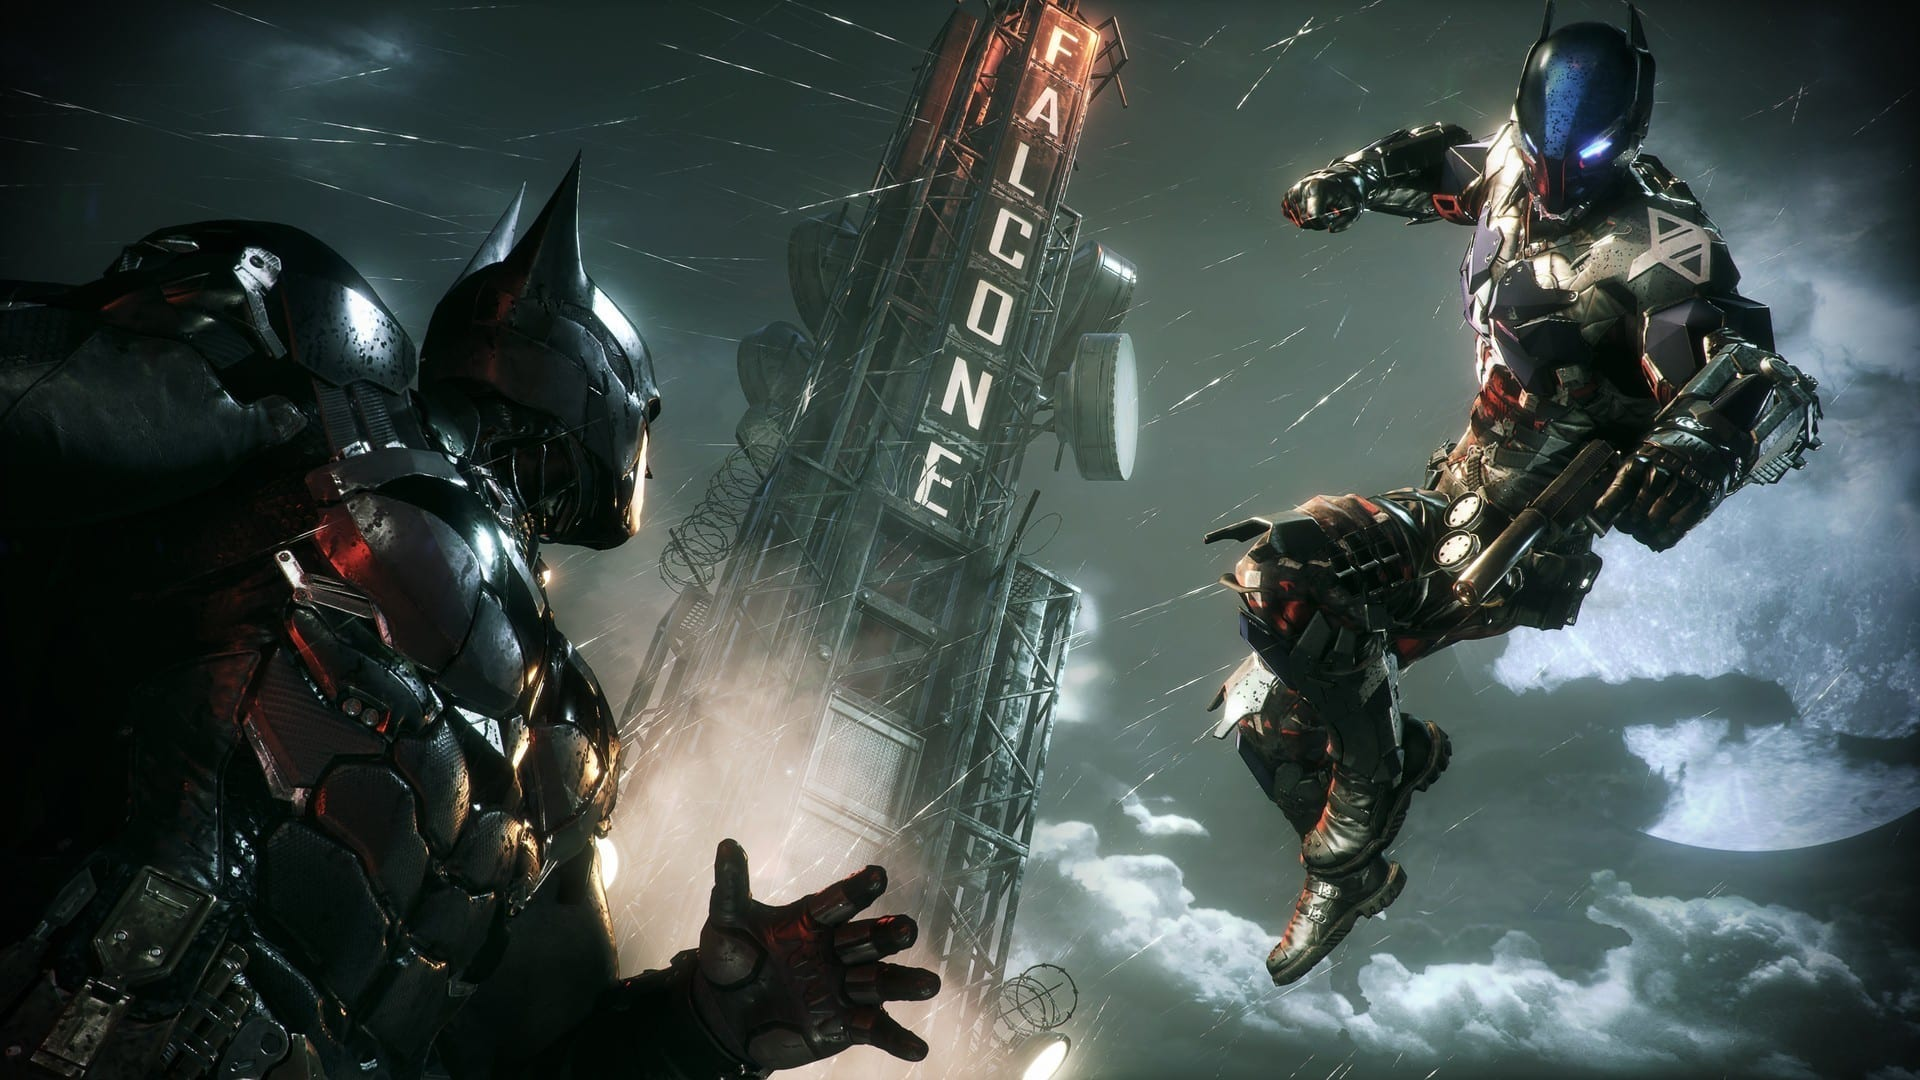 batman, arkham knight, guide, trophy, achievement, difficulty